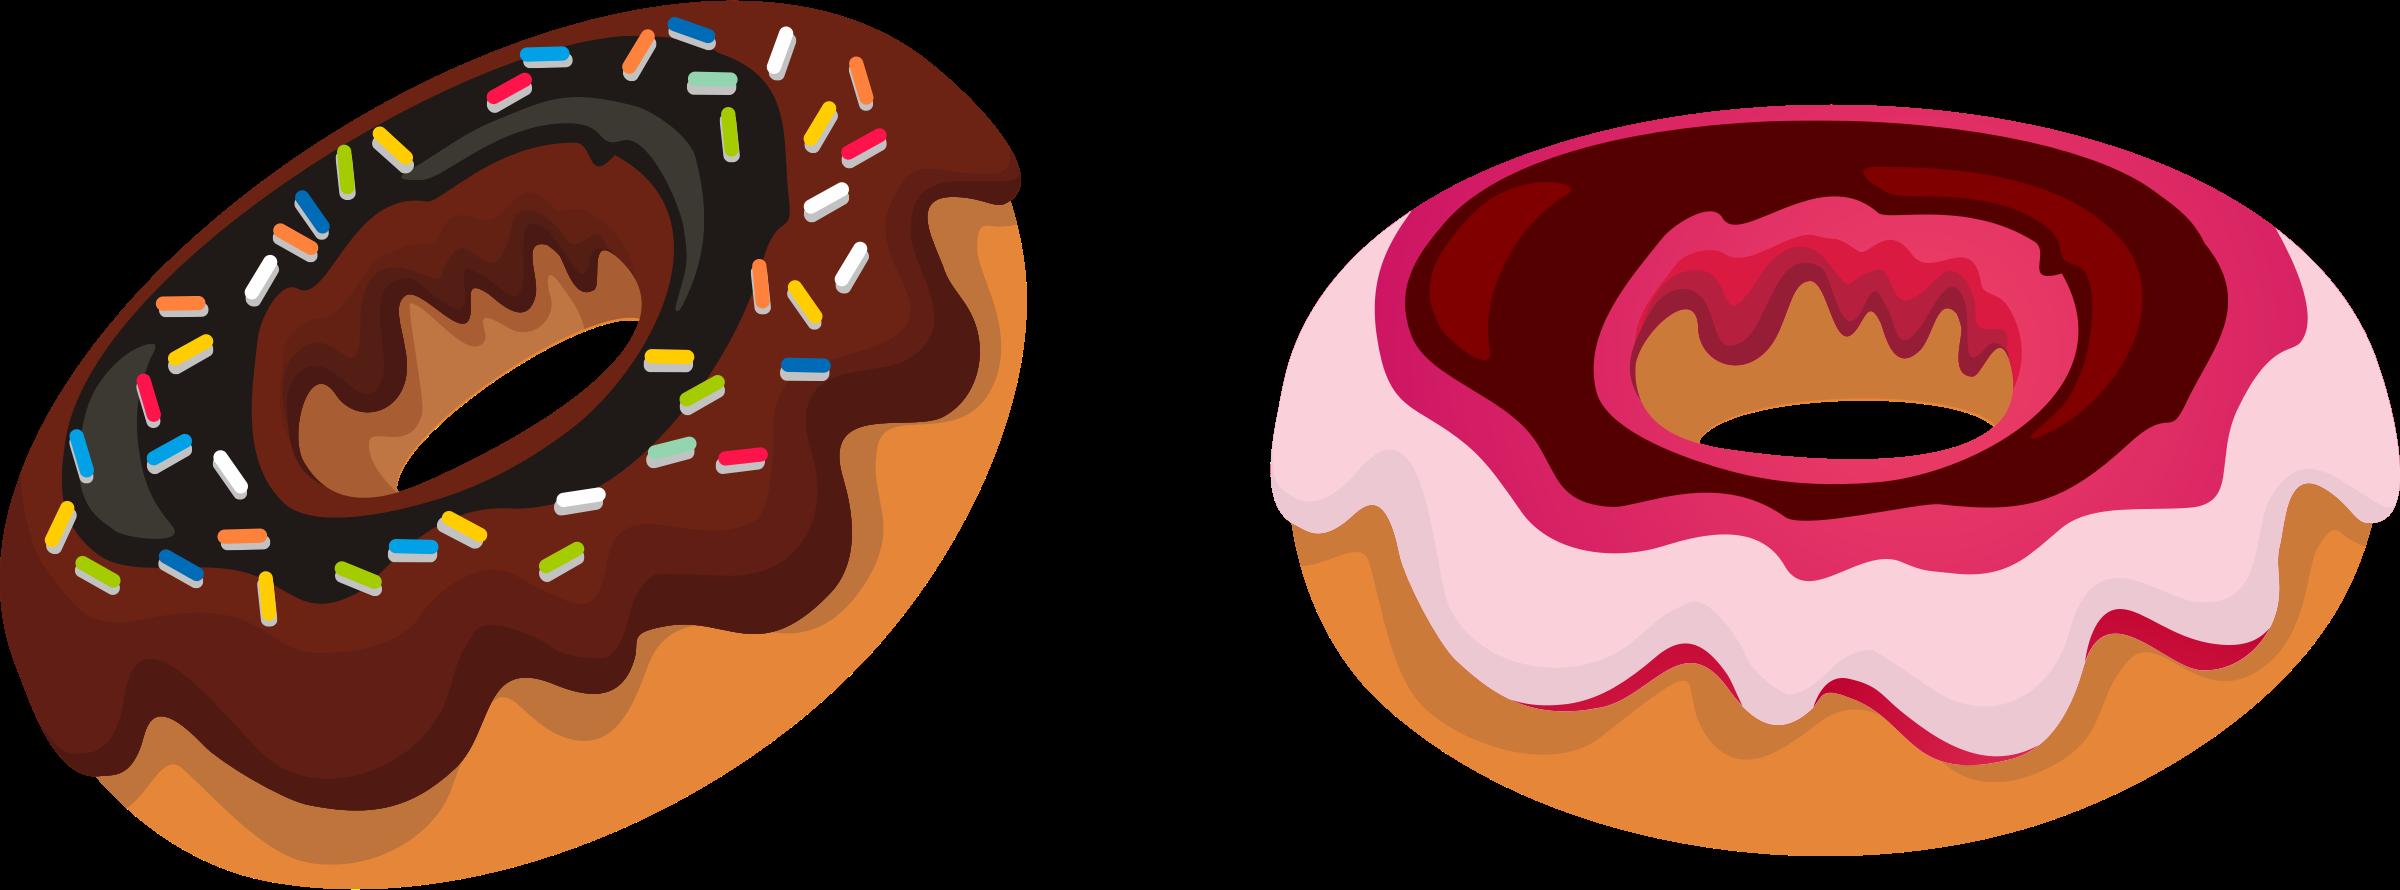 Donut clip art tumundografico